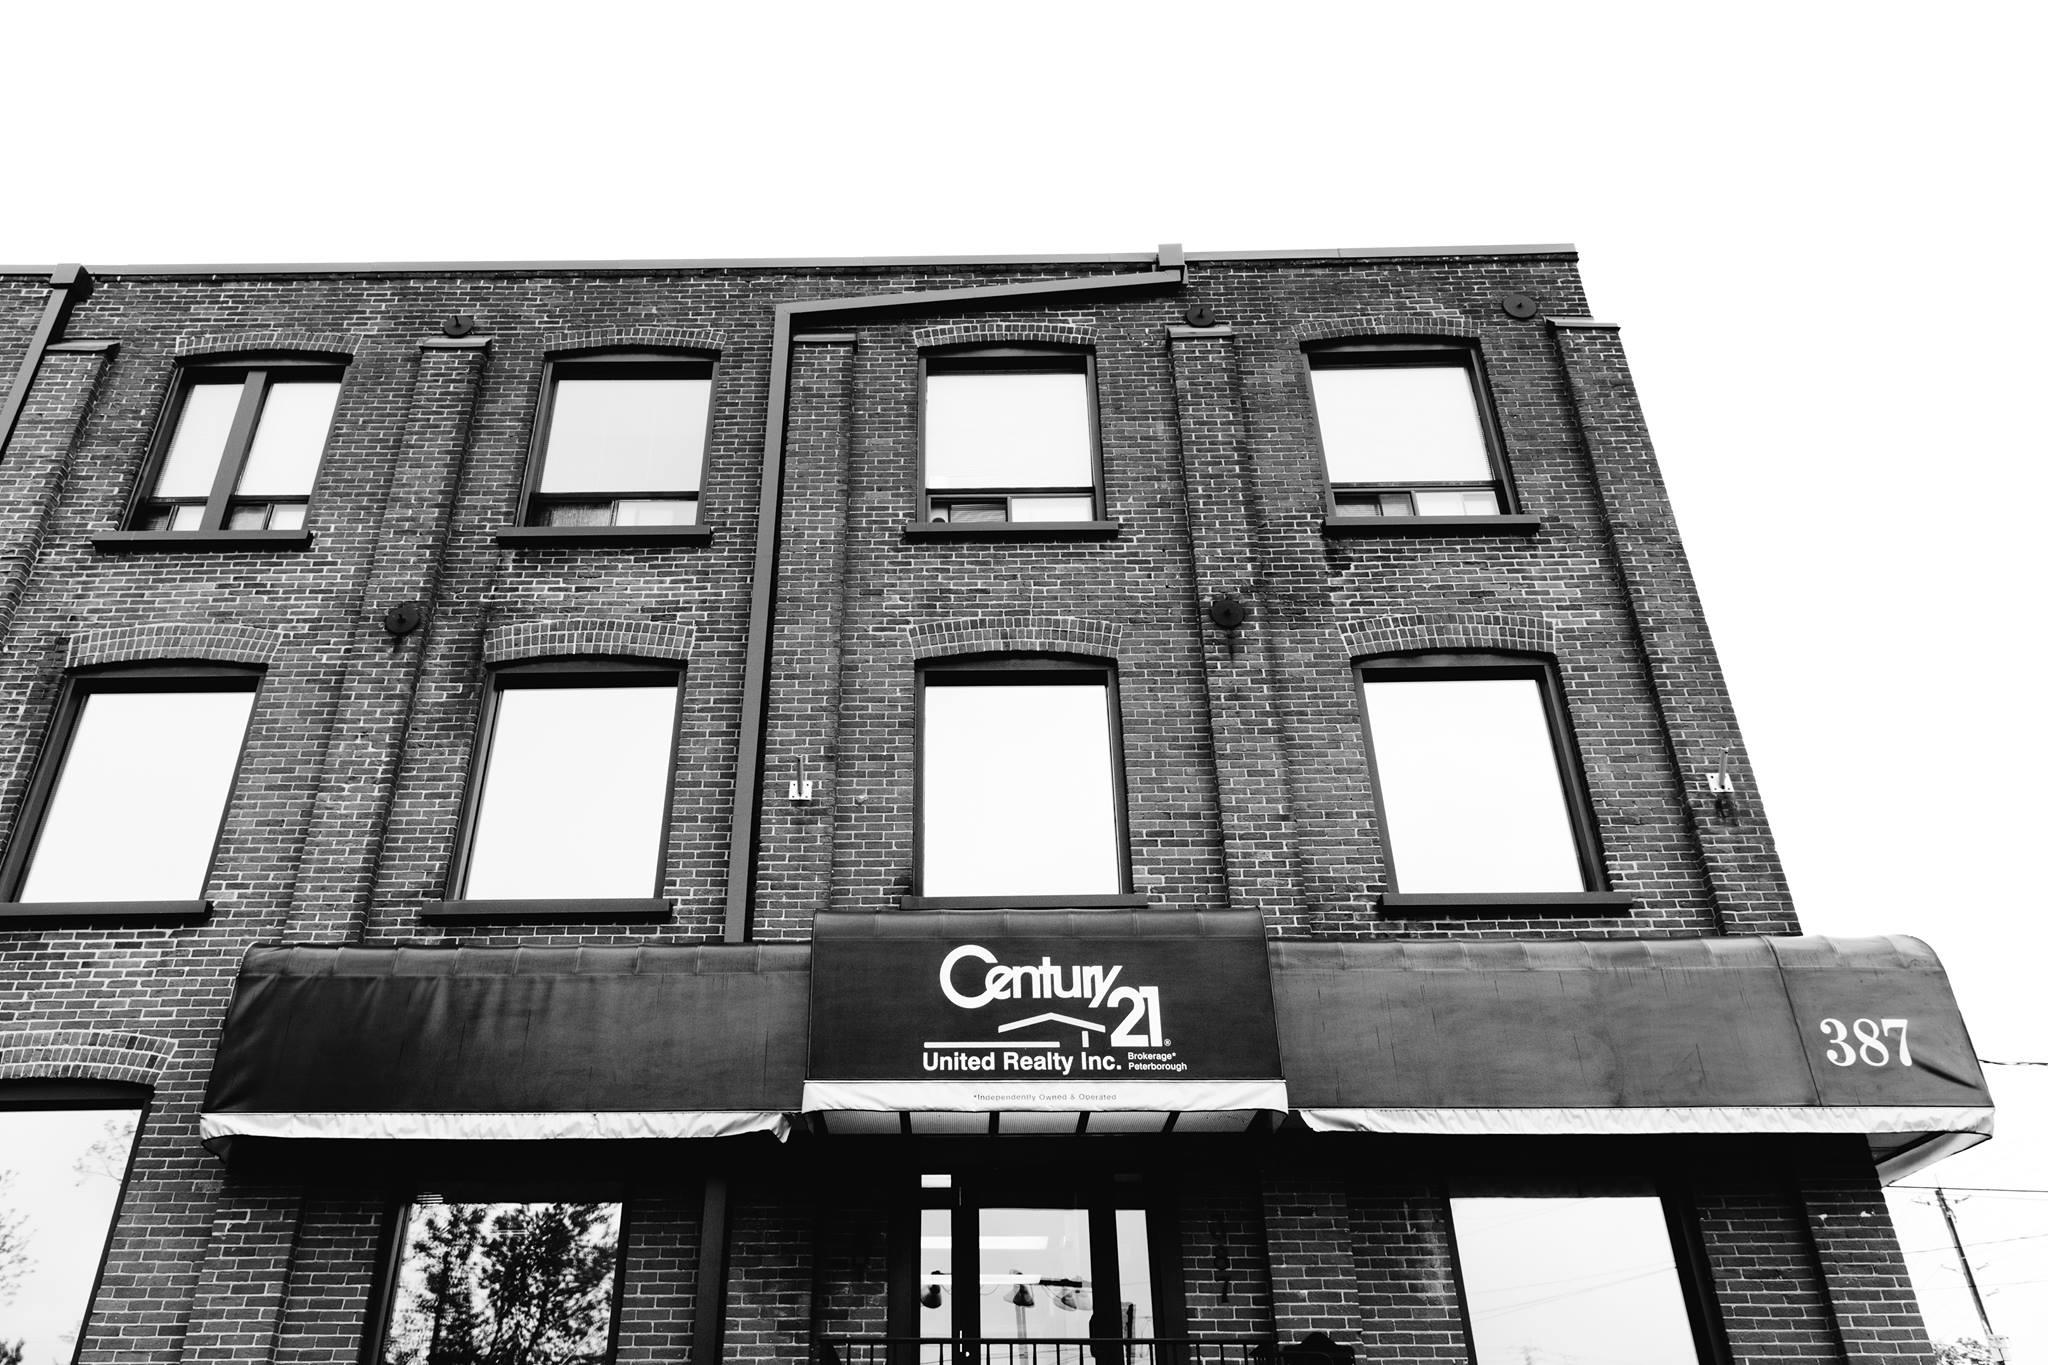 Century 21's headquarters in downtown Peterborough